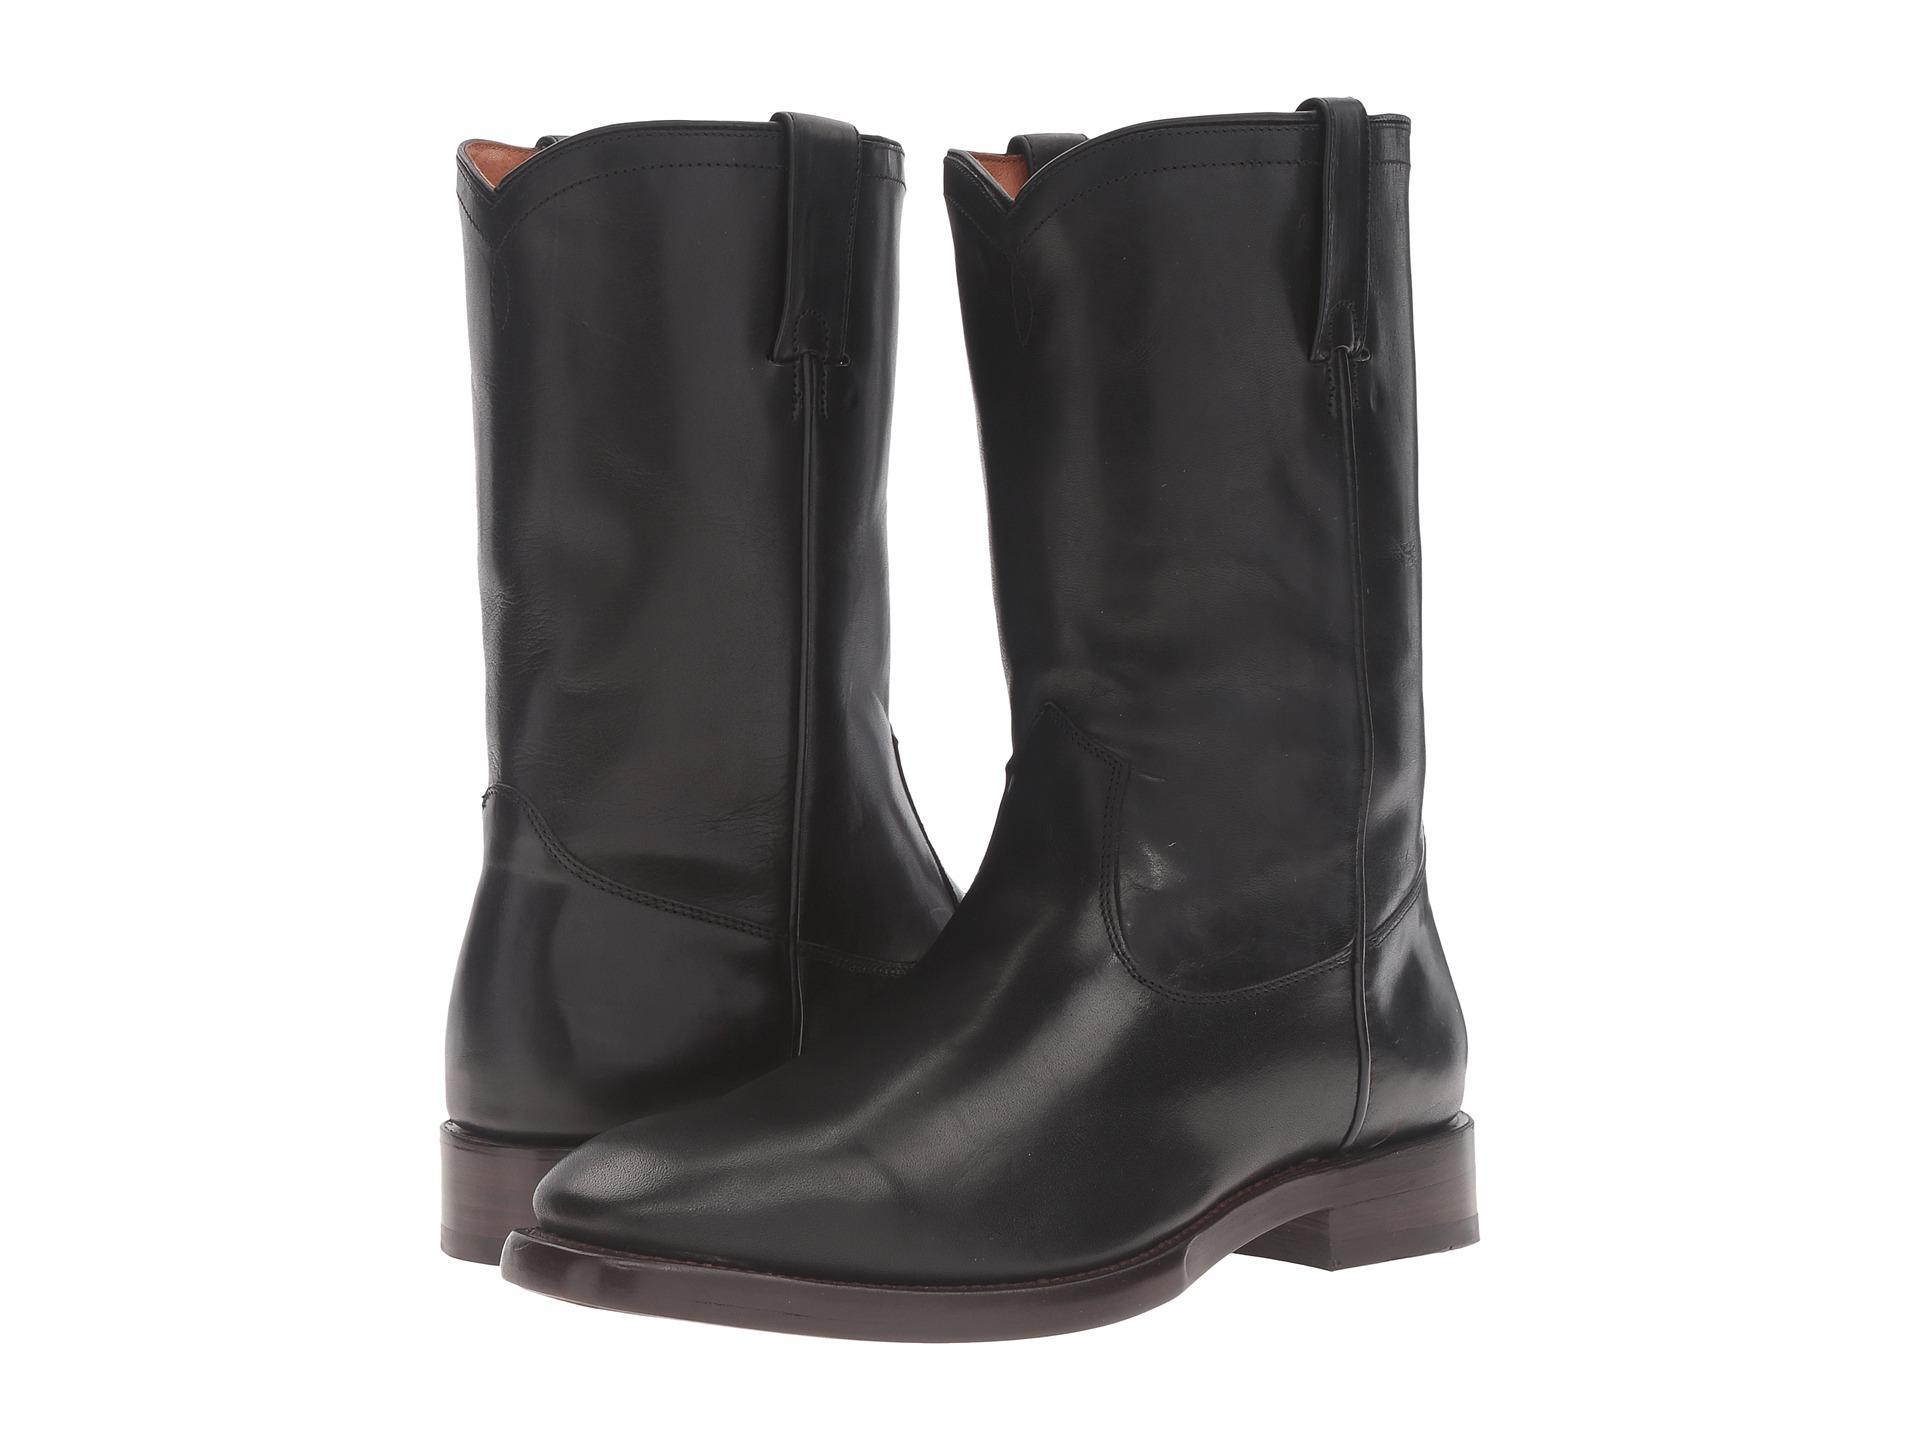 Frye Weston Roper Leather Boots In Black For Men Lyst